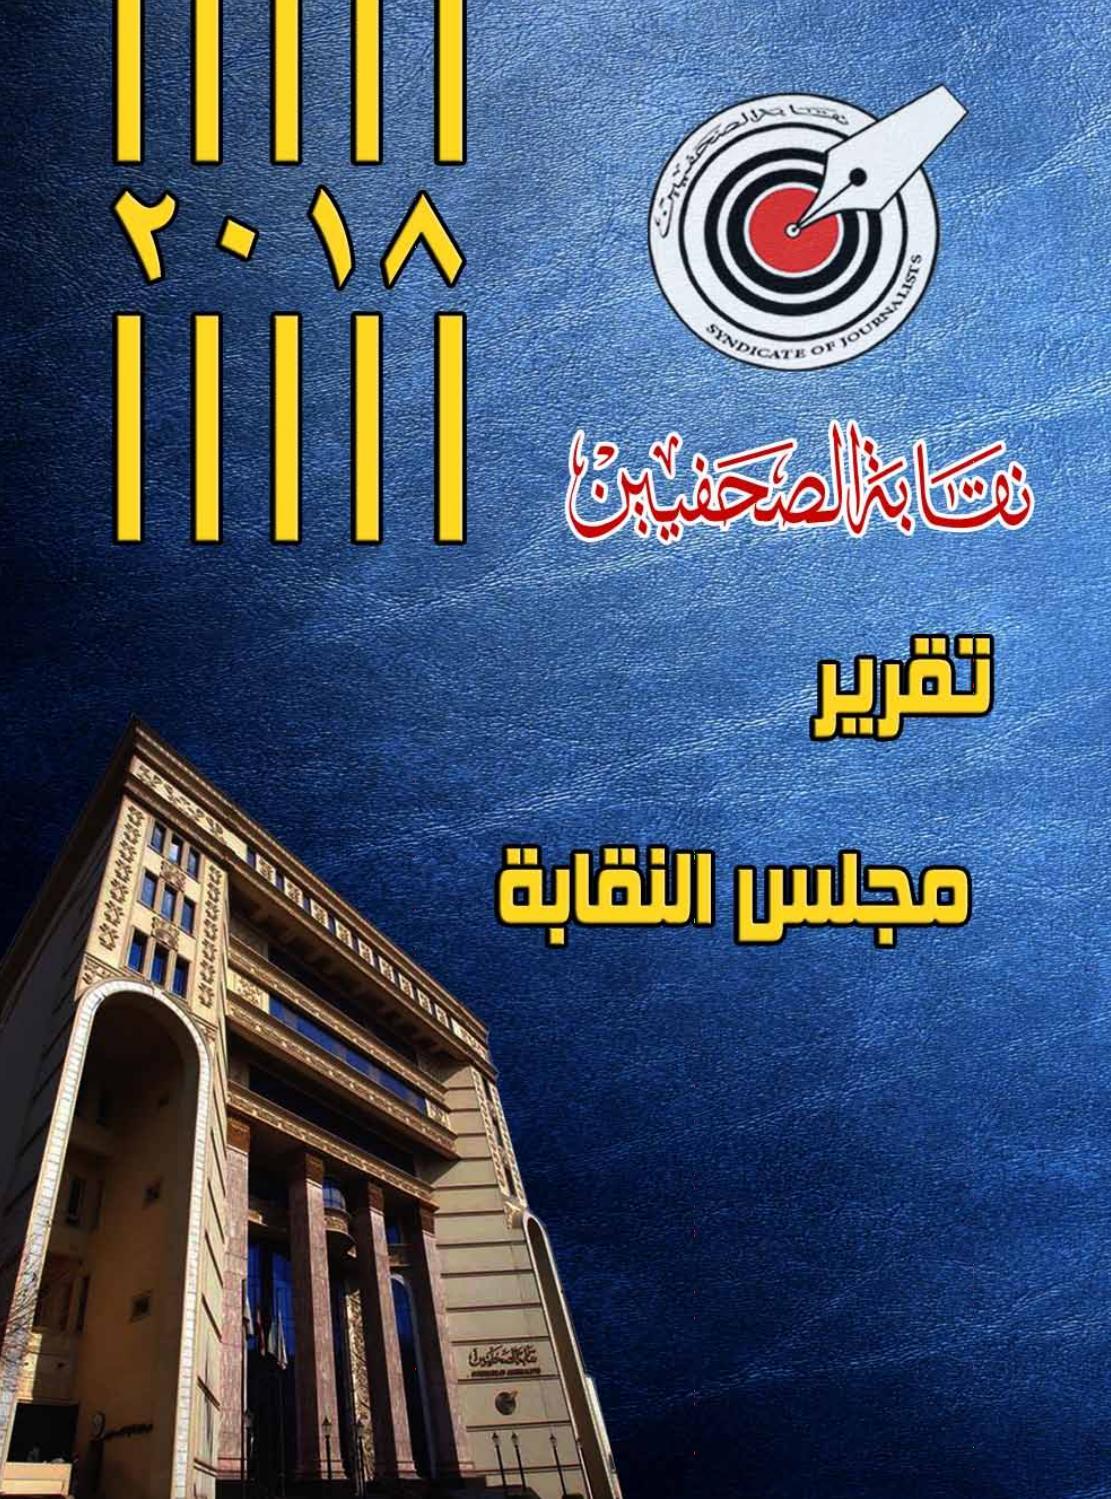 7d1bee184 2201825152918907 تقرير مجلس نقابة الصحفيين 2018 by اليوم السابع - issuu